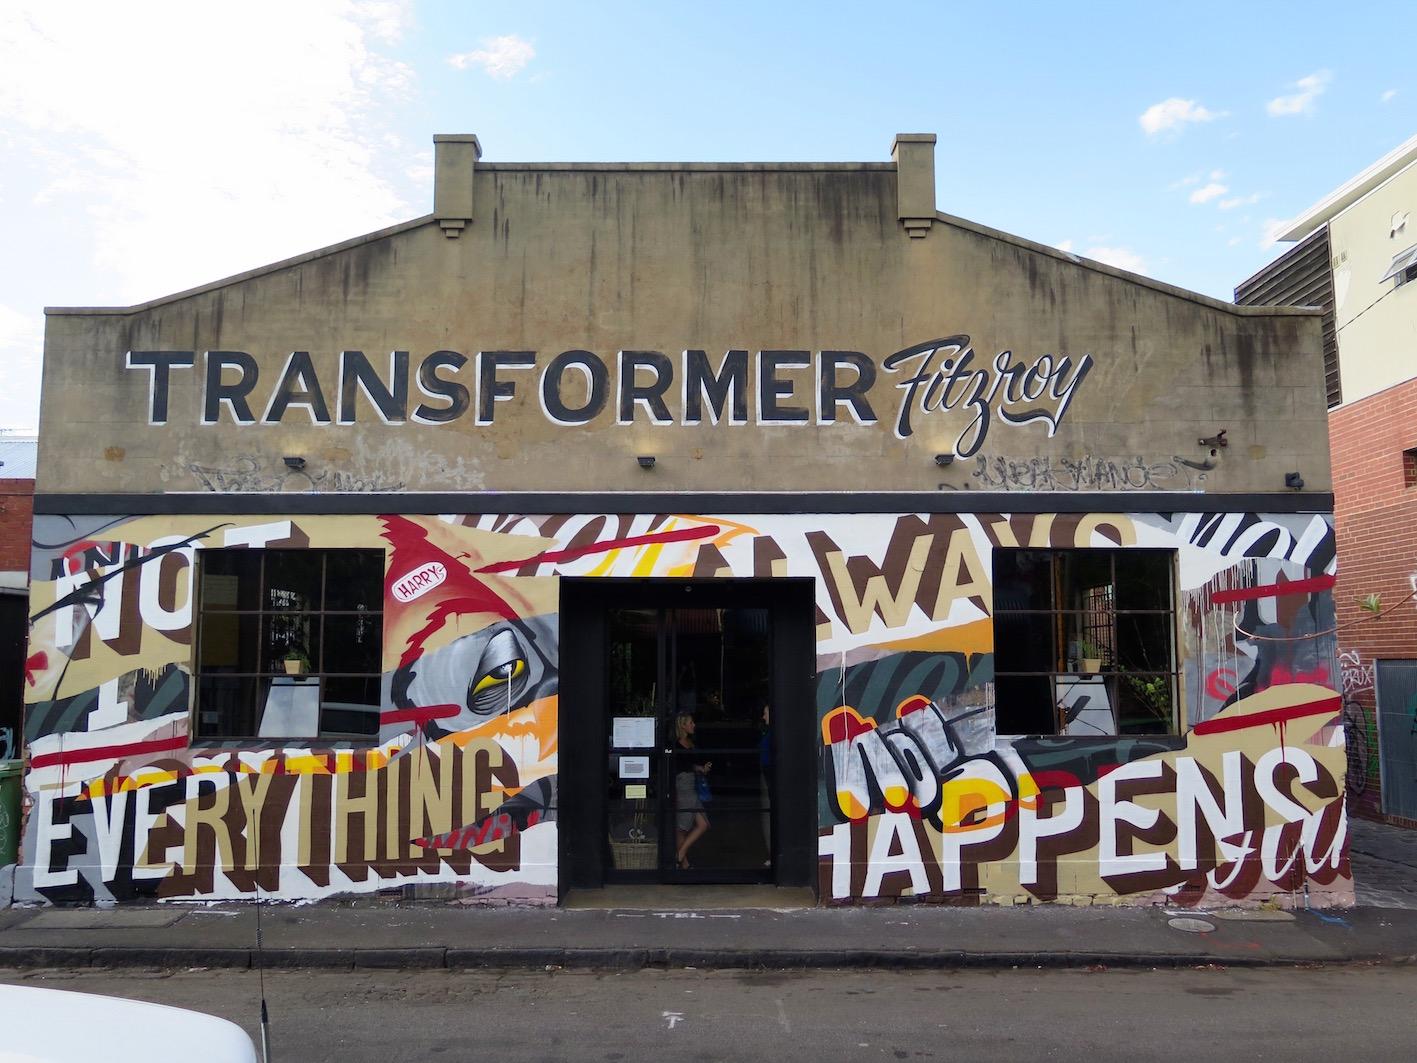 deansunshine_landofsunshine_melbourne_streetart_graffiti_never satisfied transformer 1